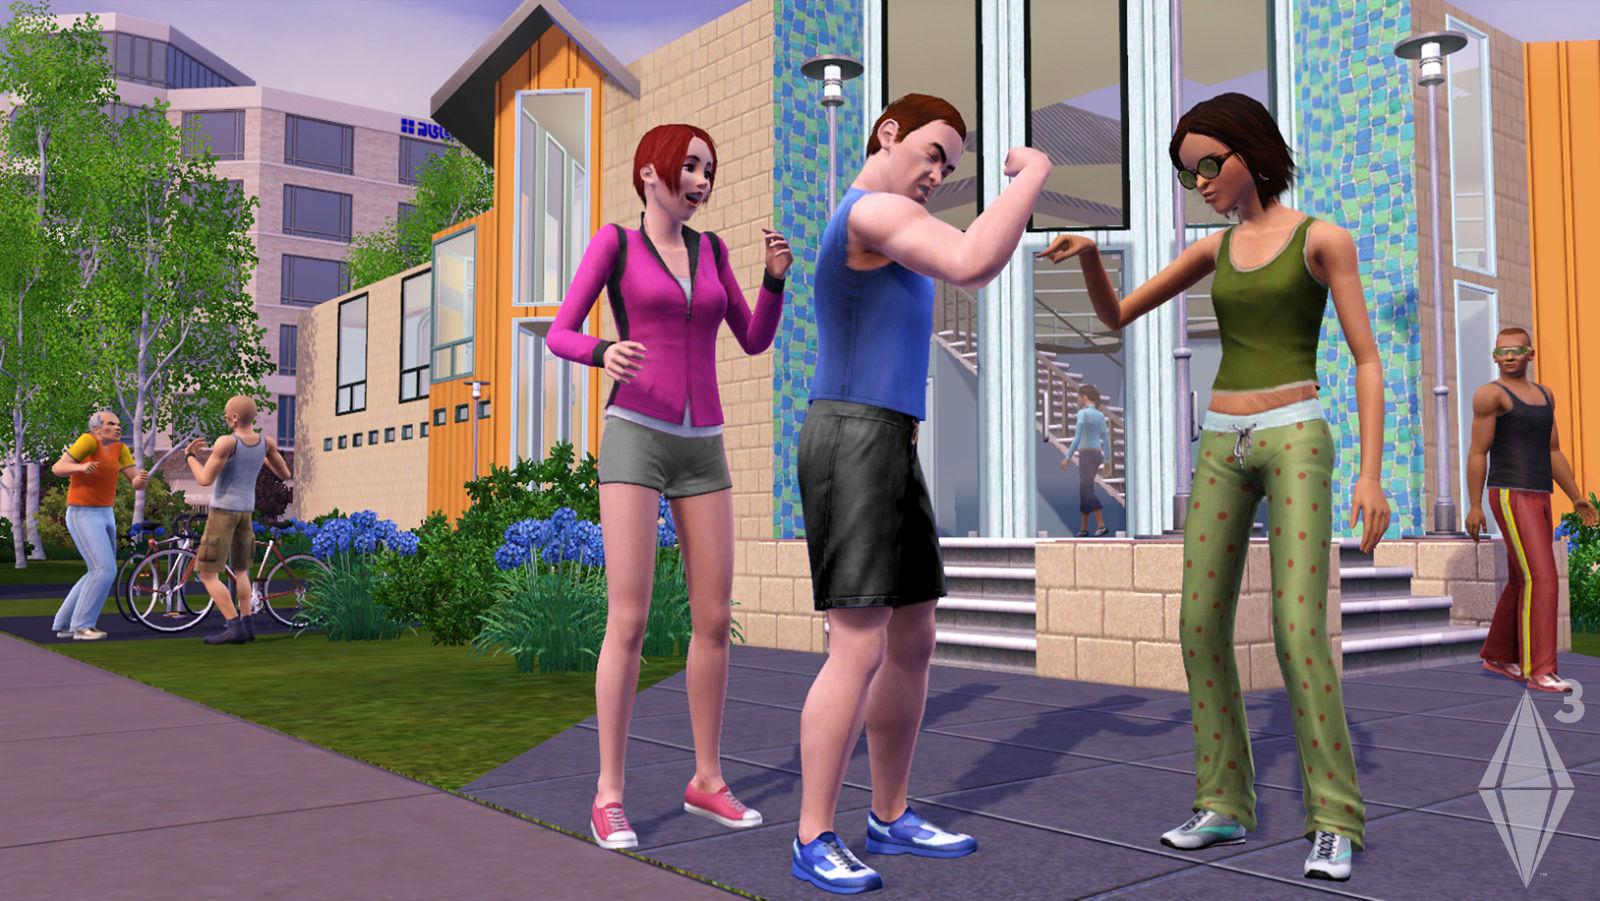 Buy The Sims 3 PC Game | Origin Download